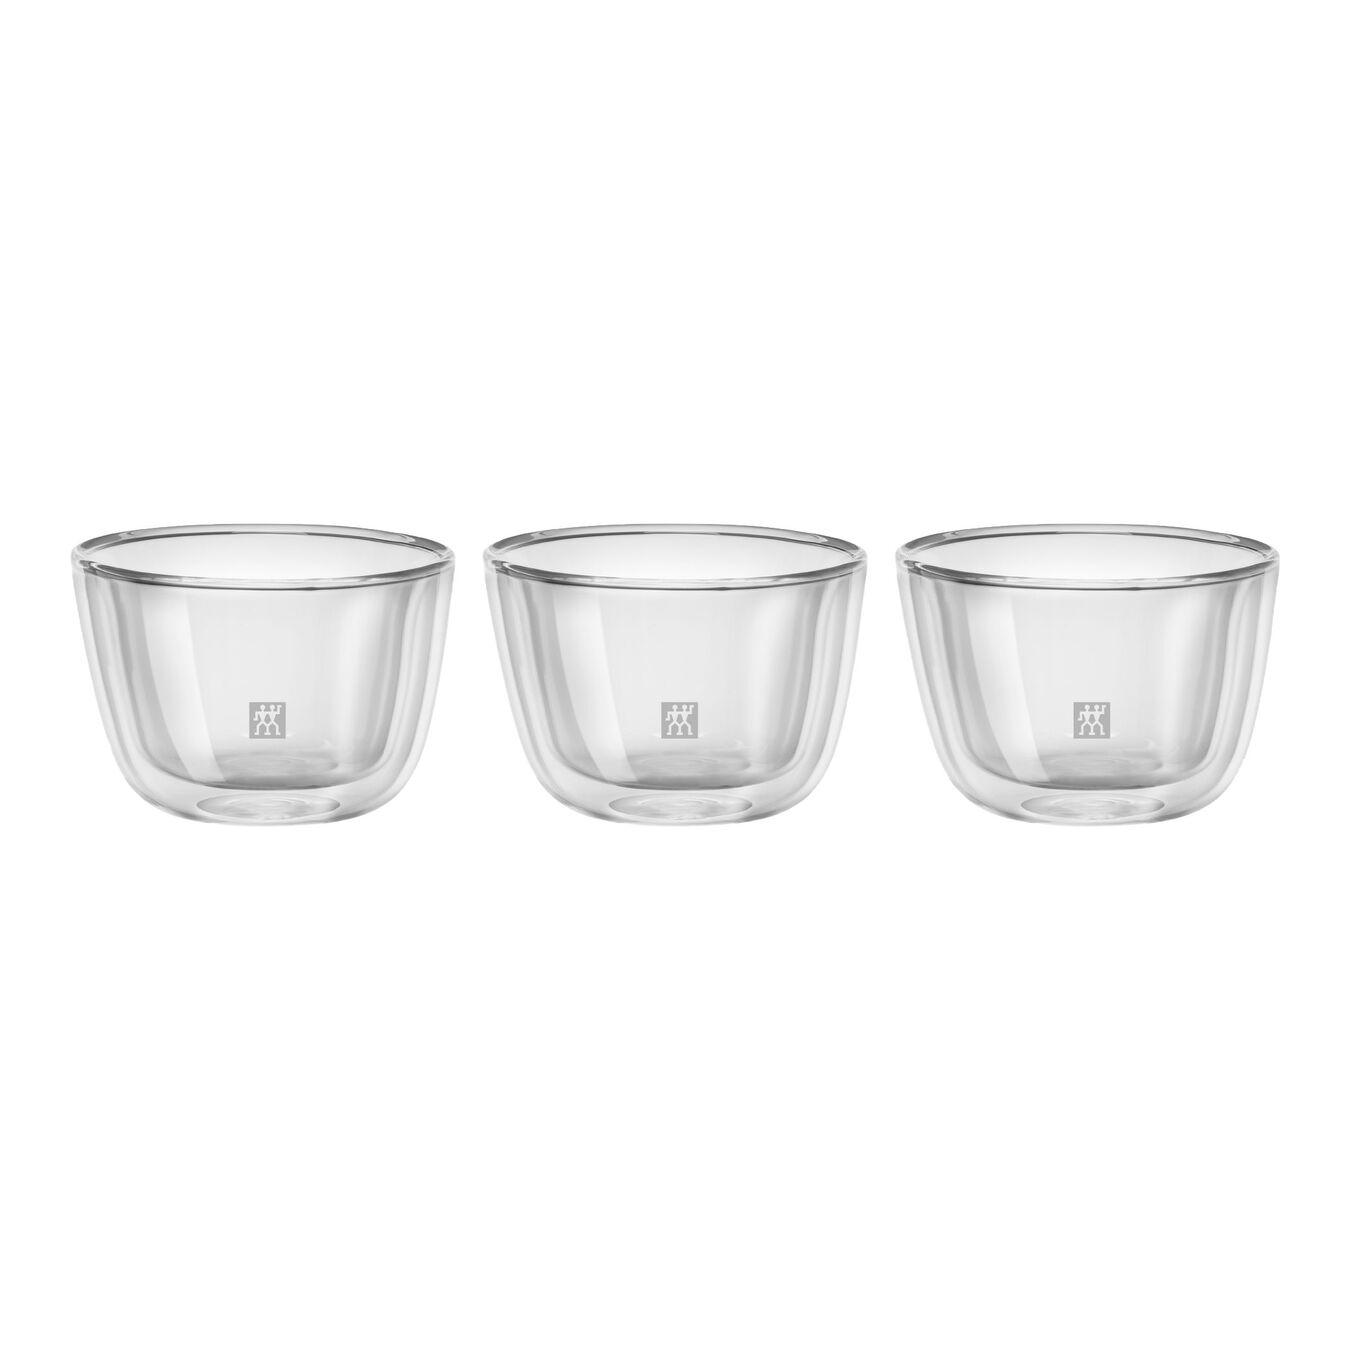 3 Piece Borosilicate glass Appetiser set, transparent,,large 1